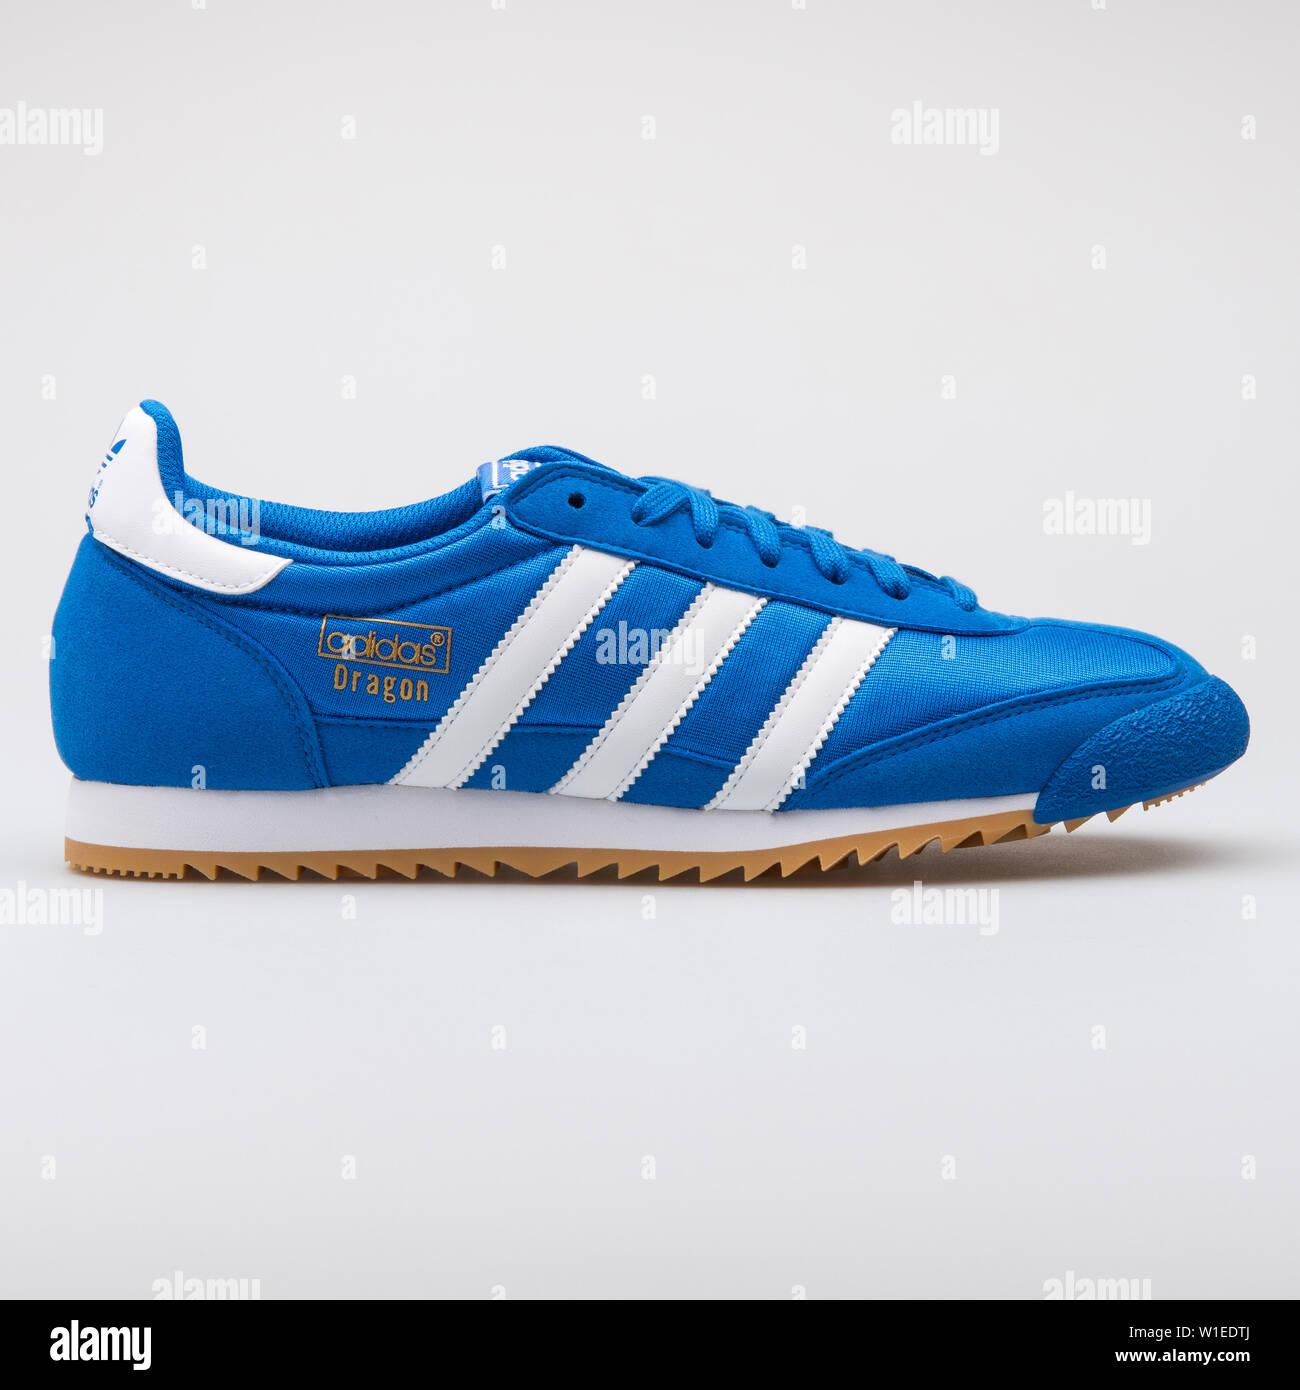 VIENNA, AUSTRIA - AUGUST 7, 2017: Adidas Dragon OG blue sneaker on ...